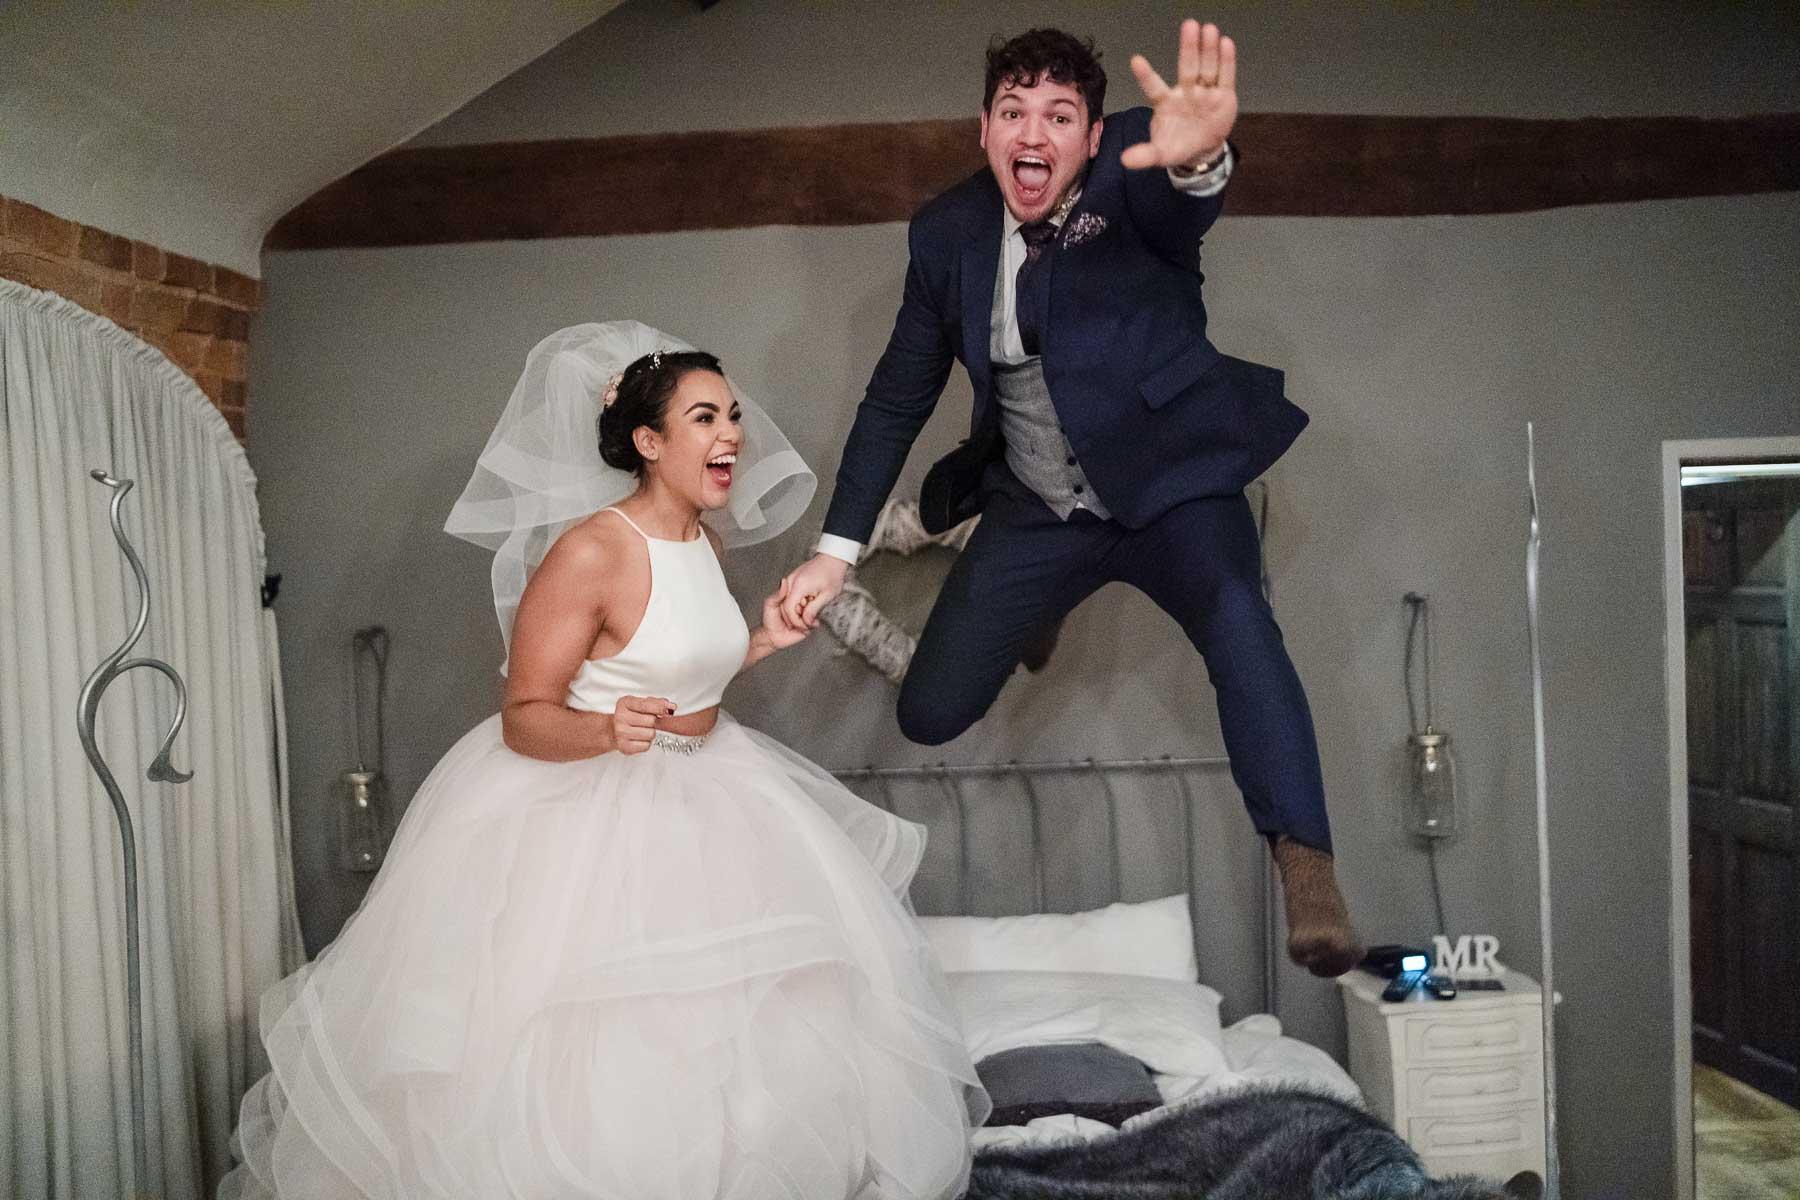 groom flying like superman